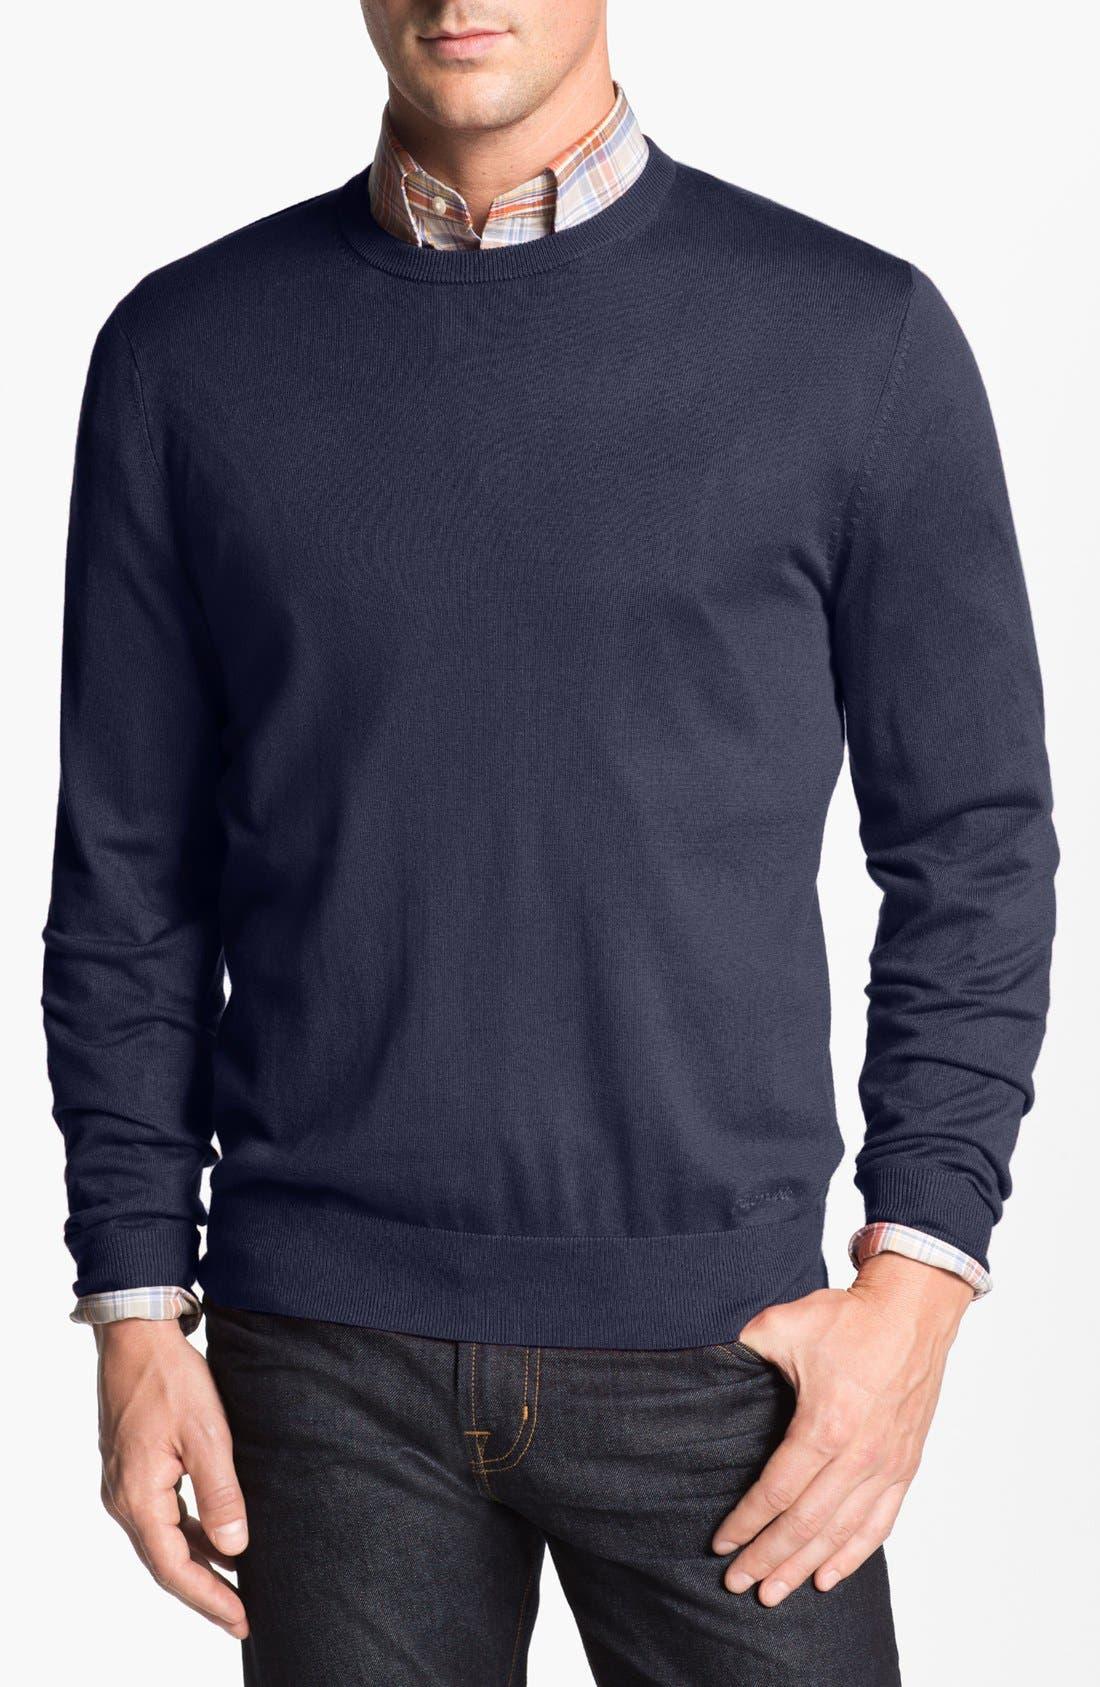 Main Image - Façonnable Crewneck 'Sicoca' Silk Blend Sweater